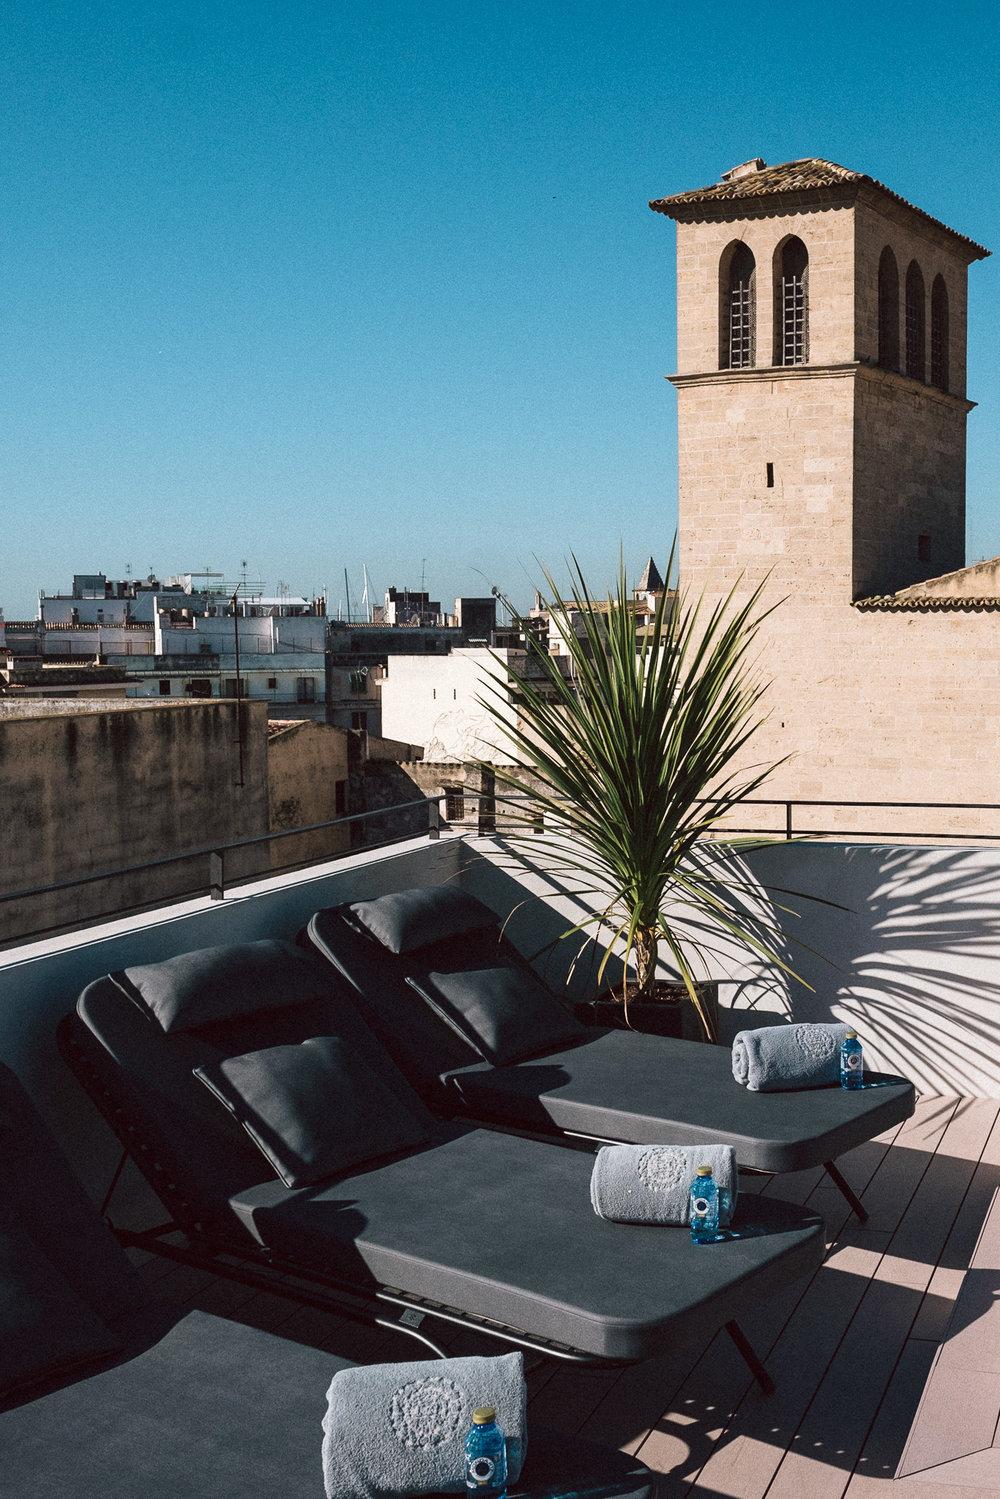 Fototagebuch_Mallorca_180328_073.jpg